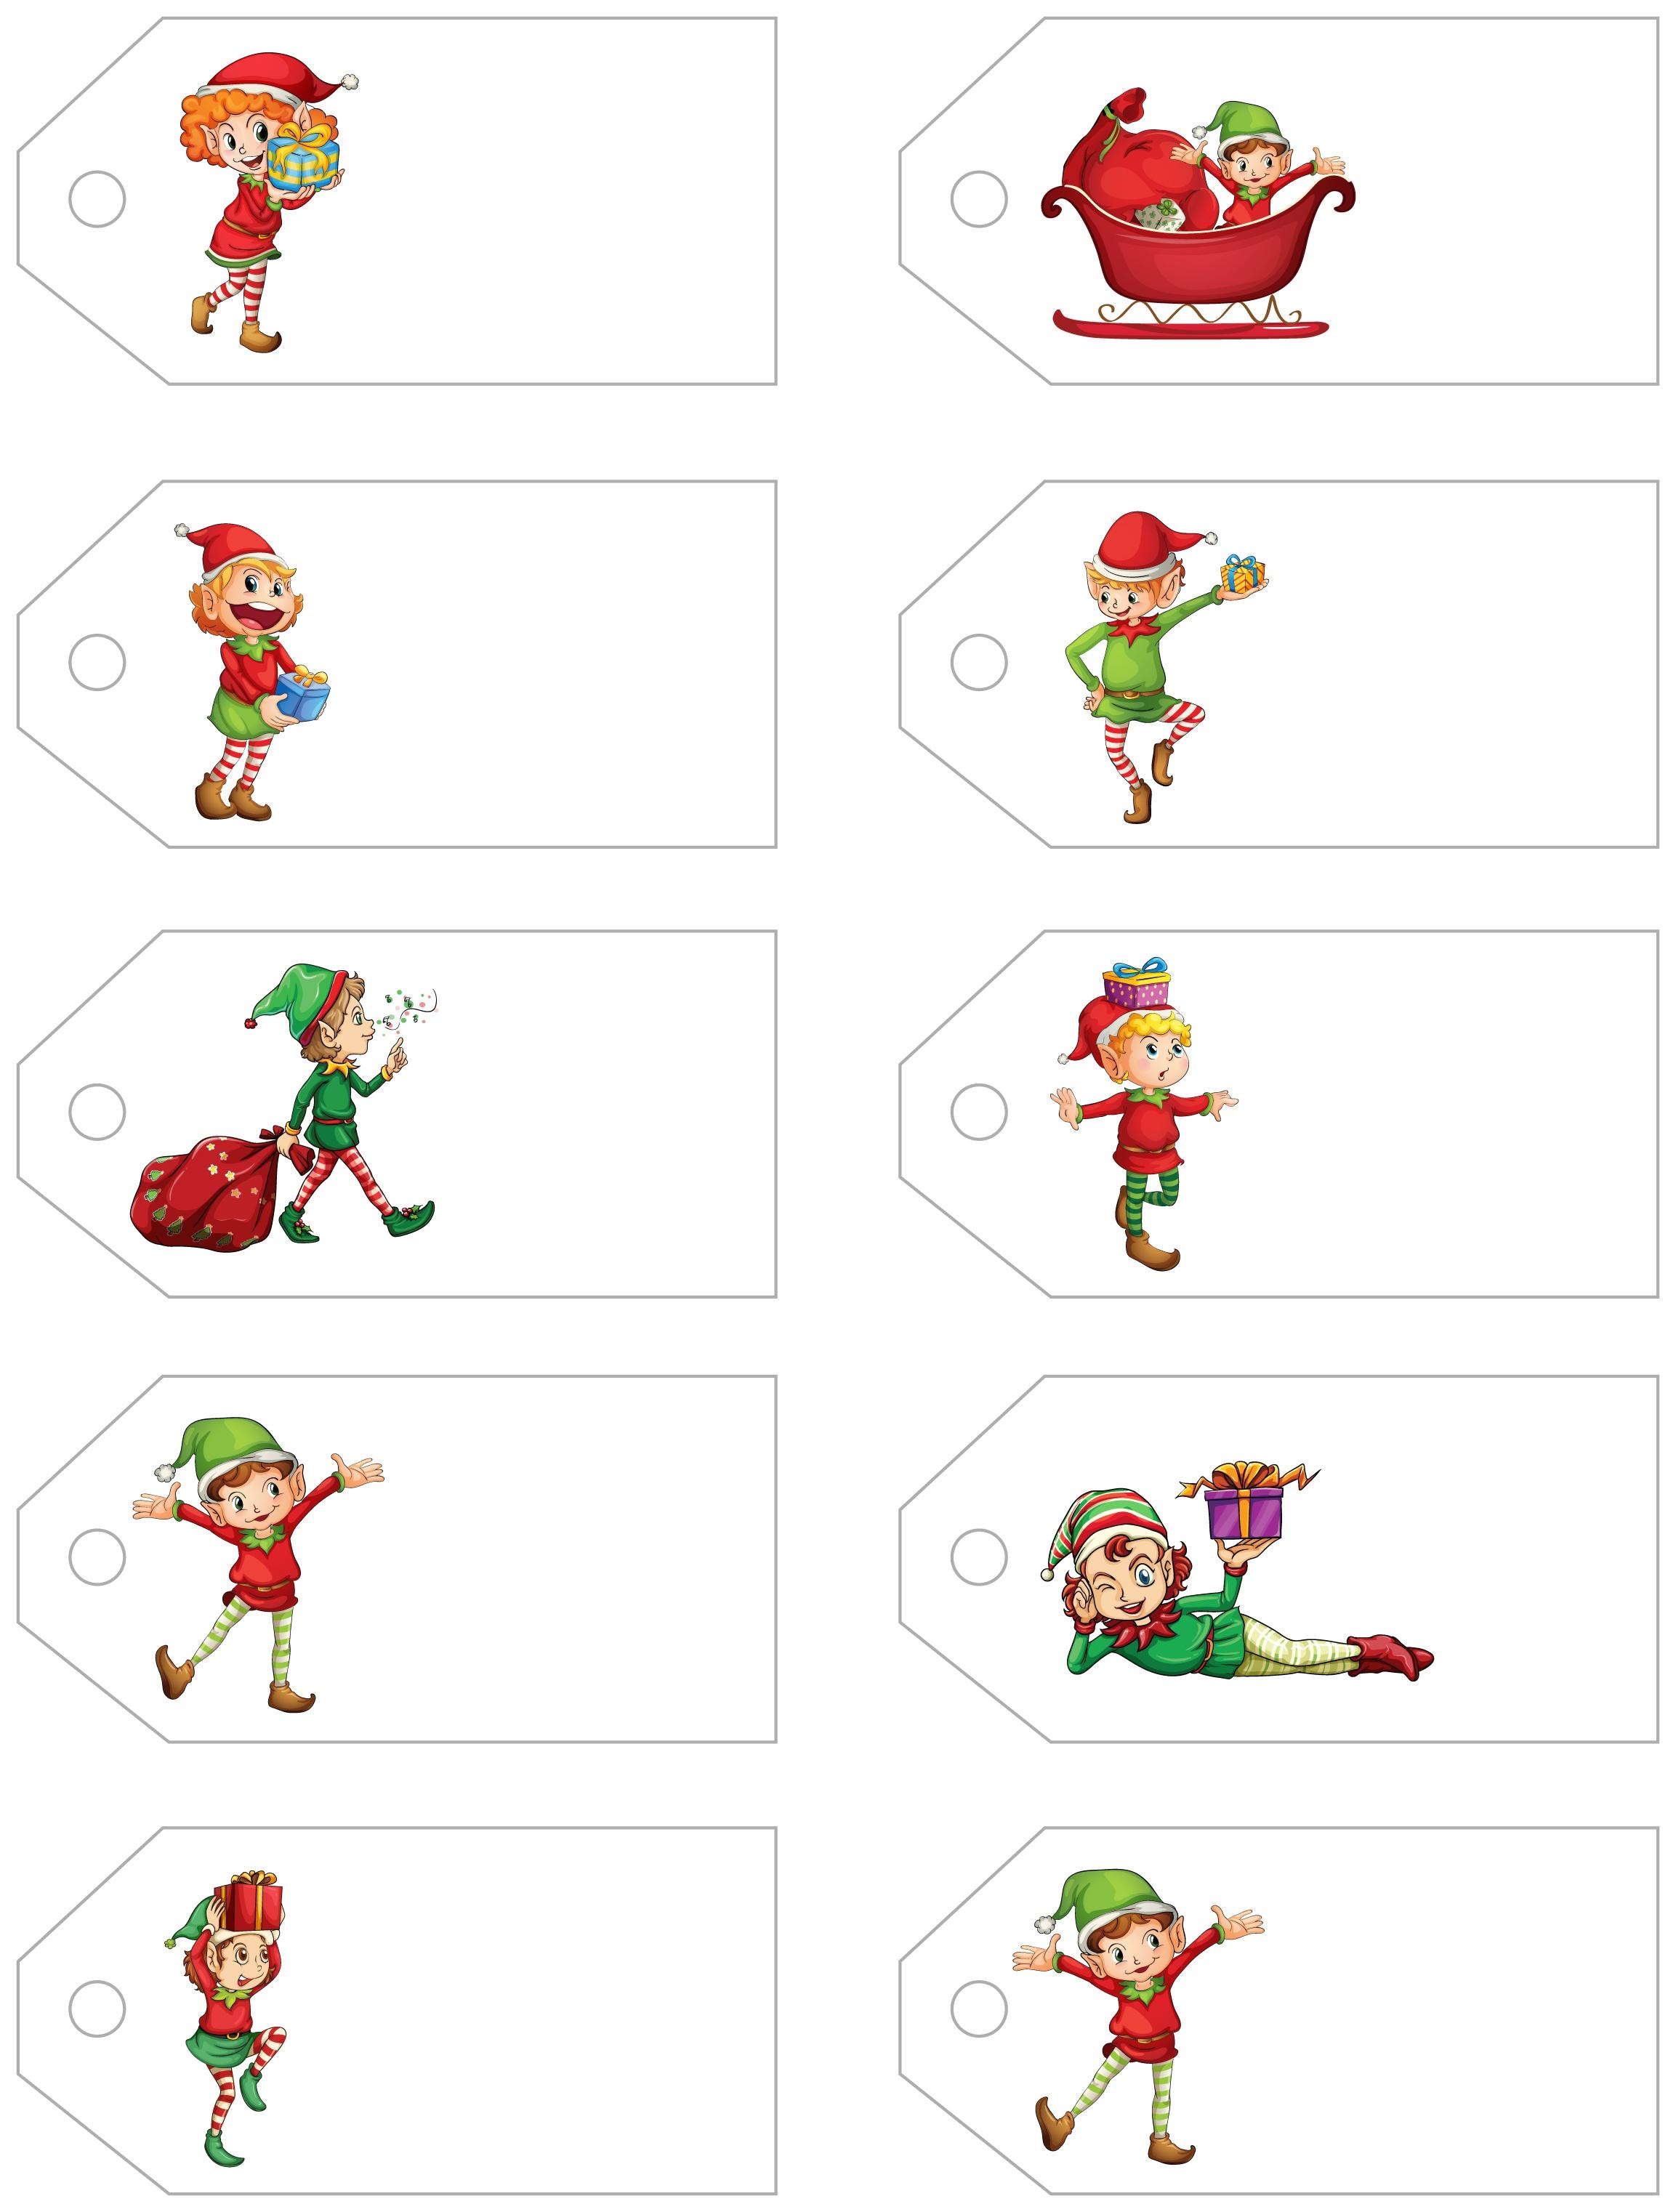 Santa's Little Gift To You! Free Printable Gift Tags And Labels - Free Printable Holiday Gift Labels